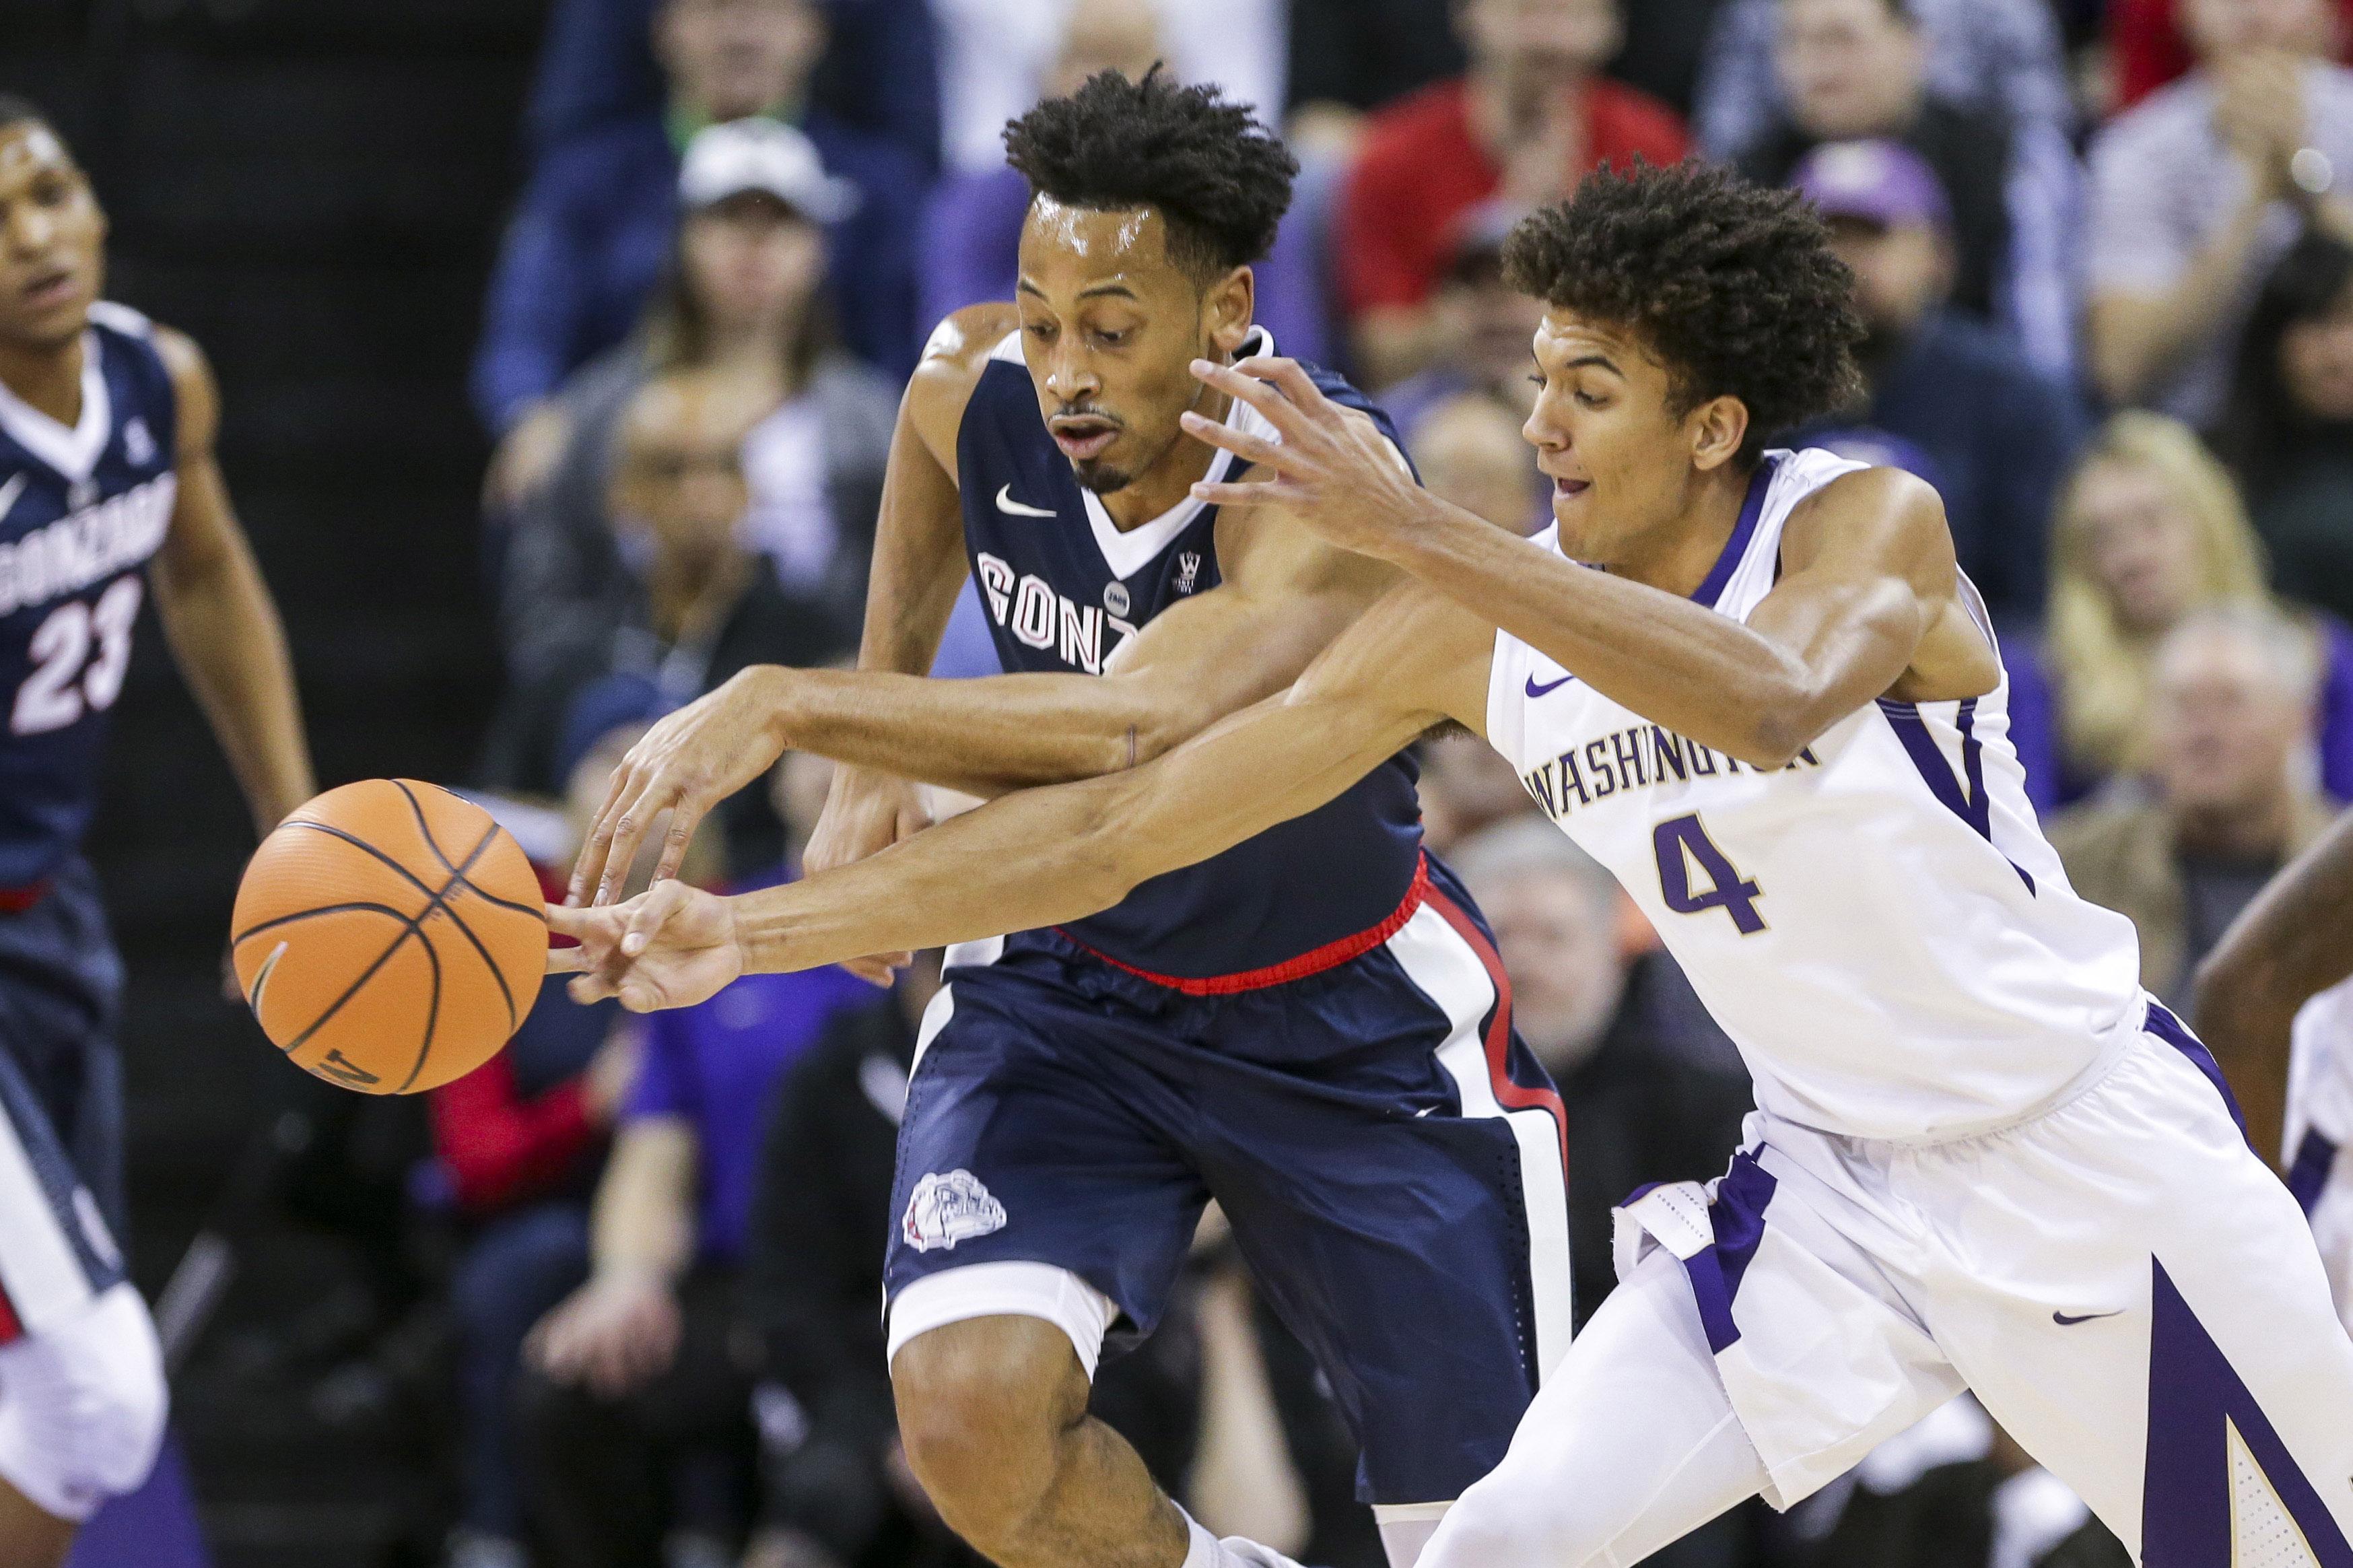 NCAA Basketball: Gonzaga at Washington